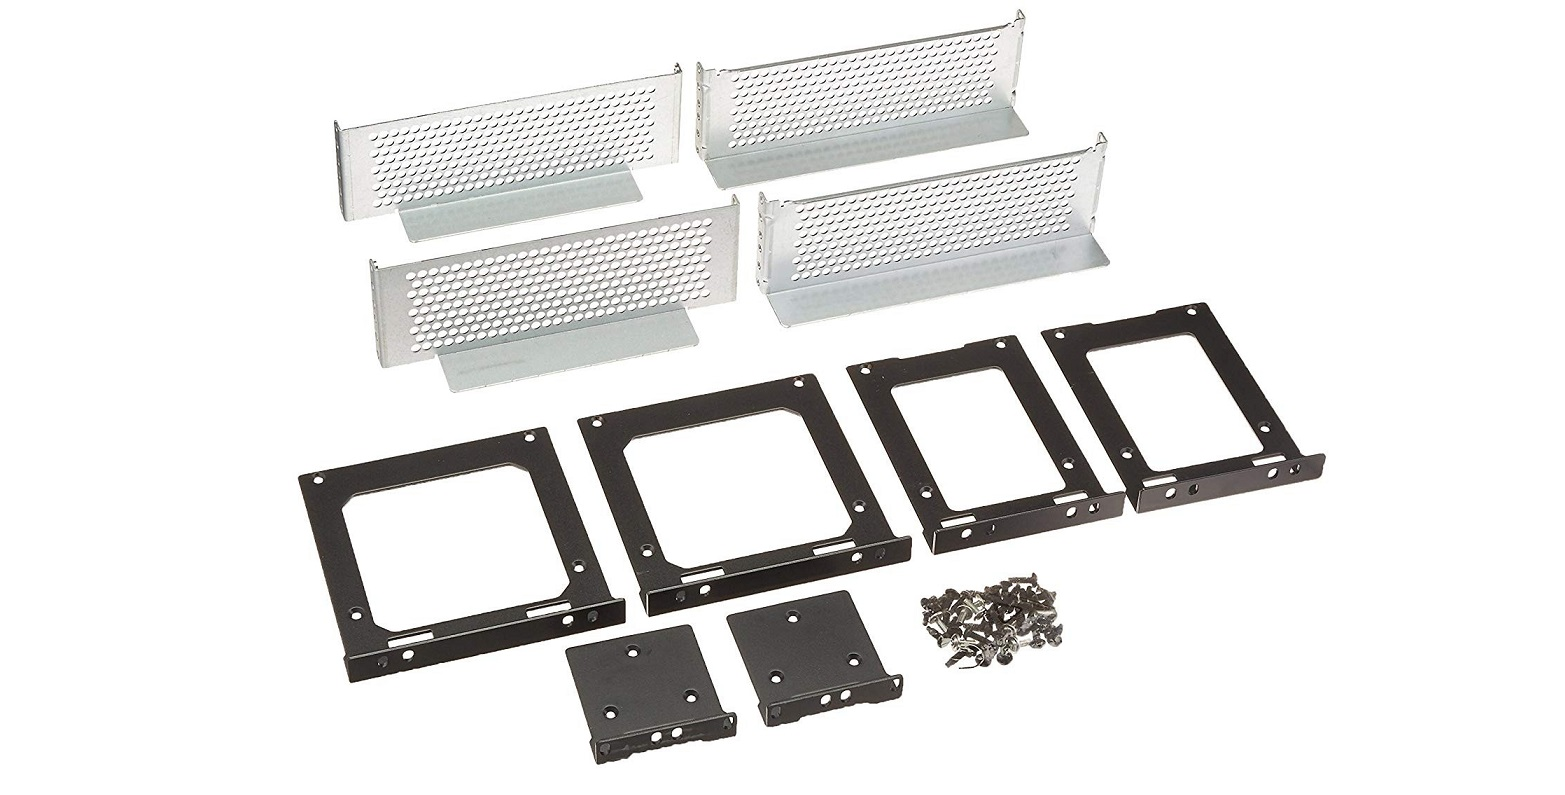 APC SRTRK3 2-Post Mounting Rail Kit For Smart-UPS SRT